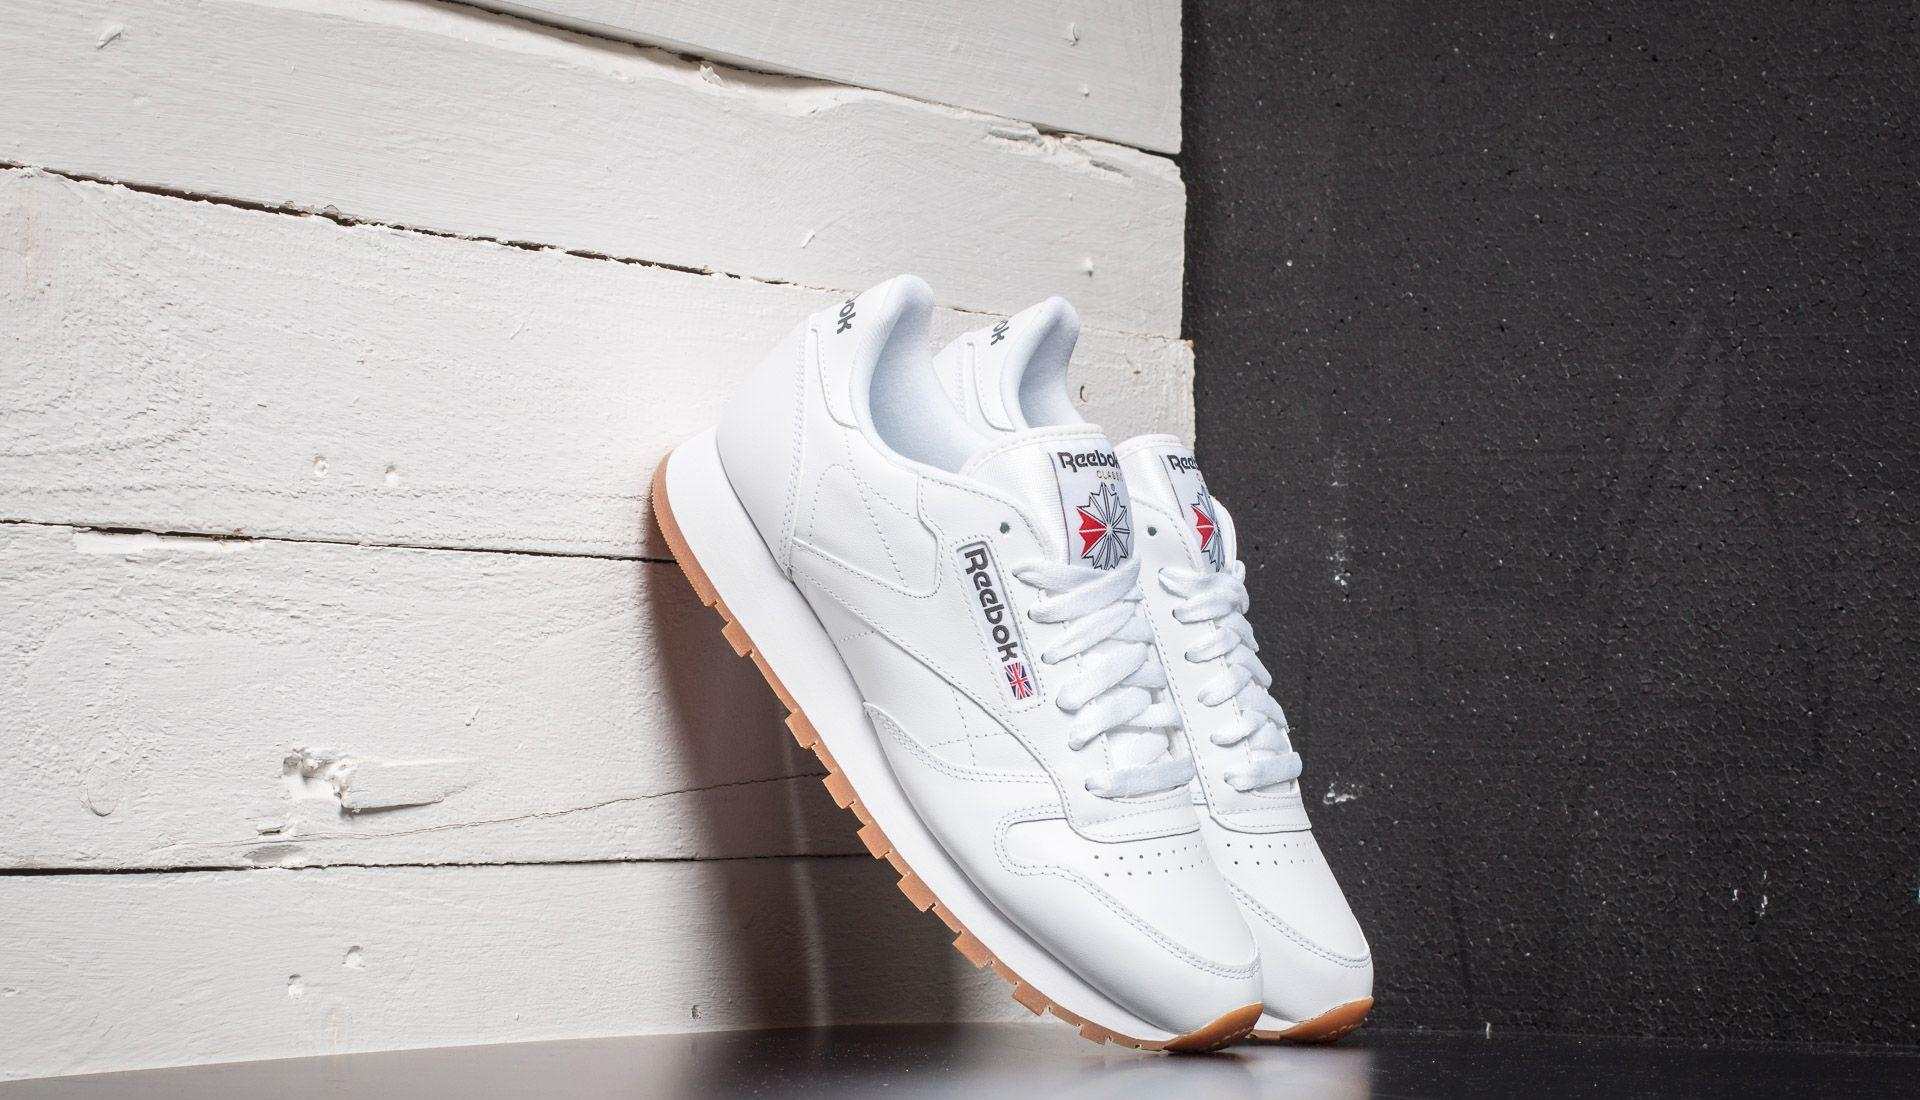 Reebok Classic Leather White/ Gum